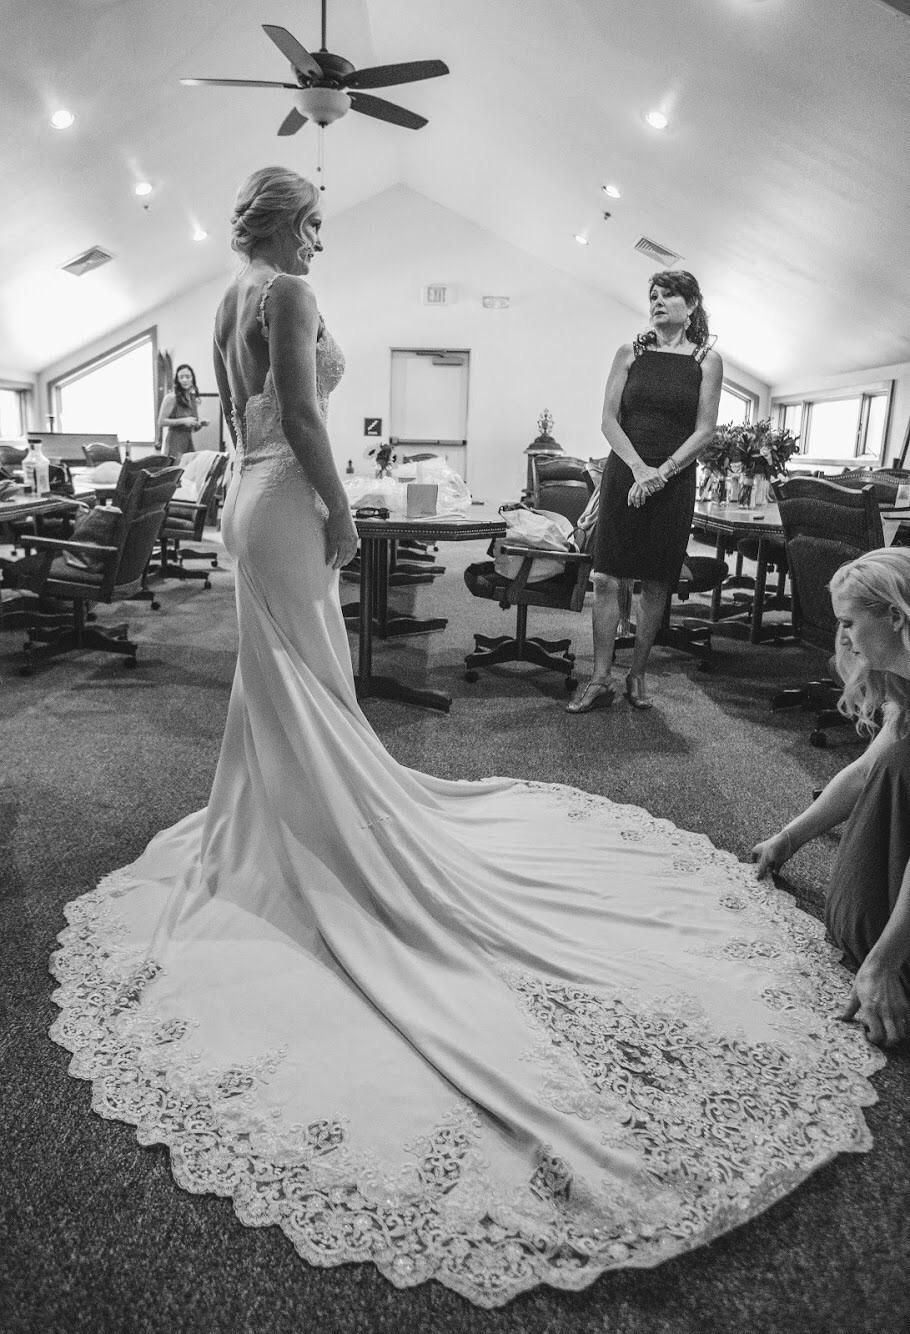 Martina liana 753 preowned wedding dress on sale for How much are martina liana wedding dresses